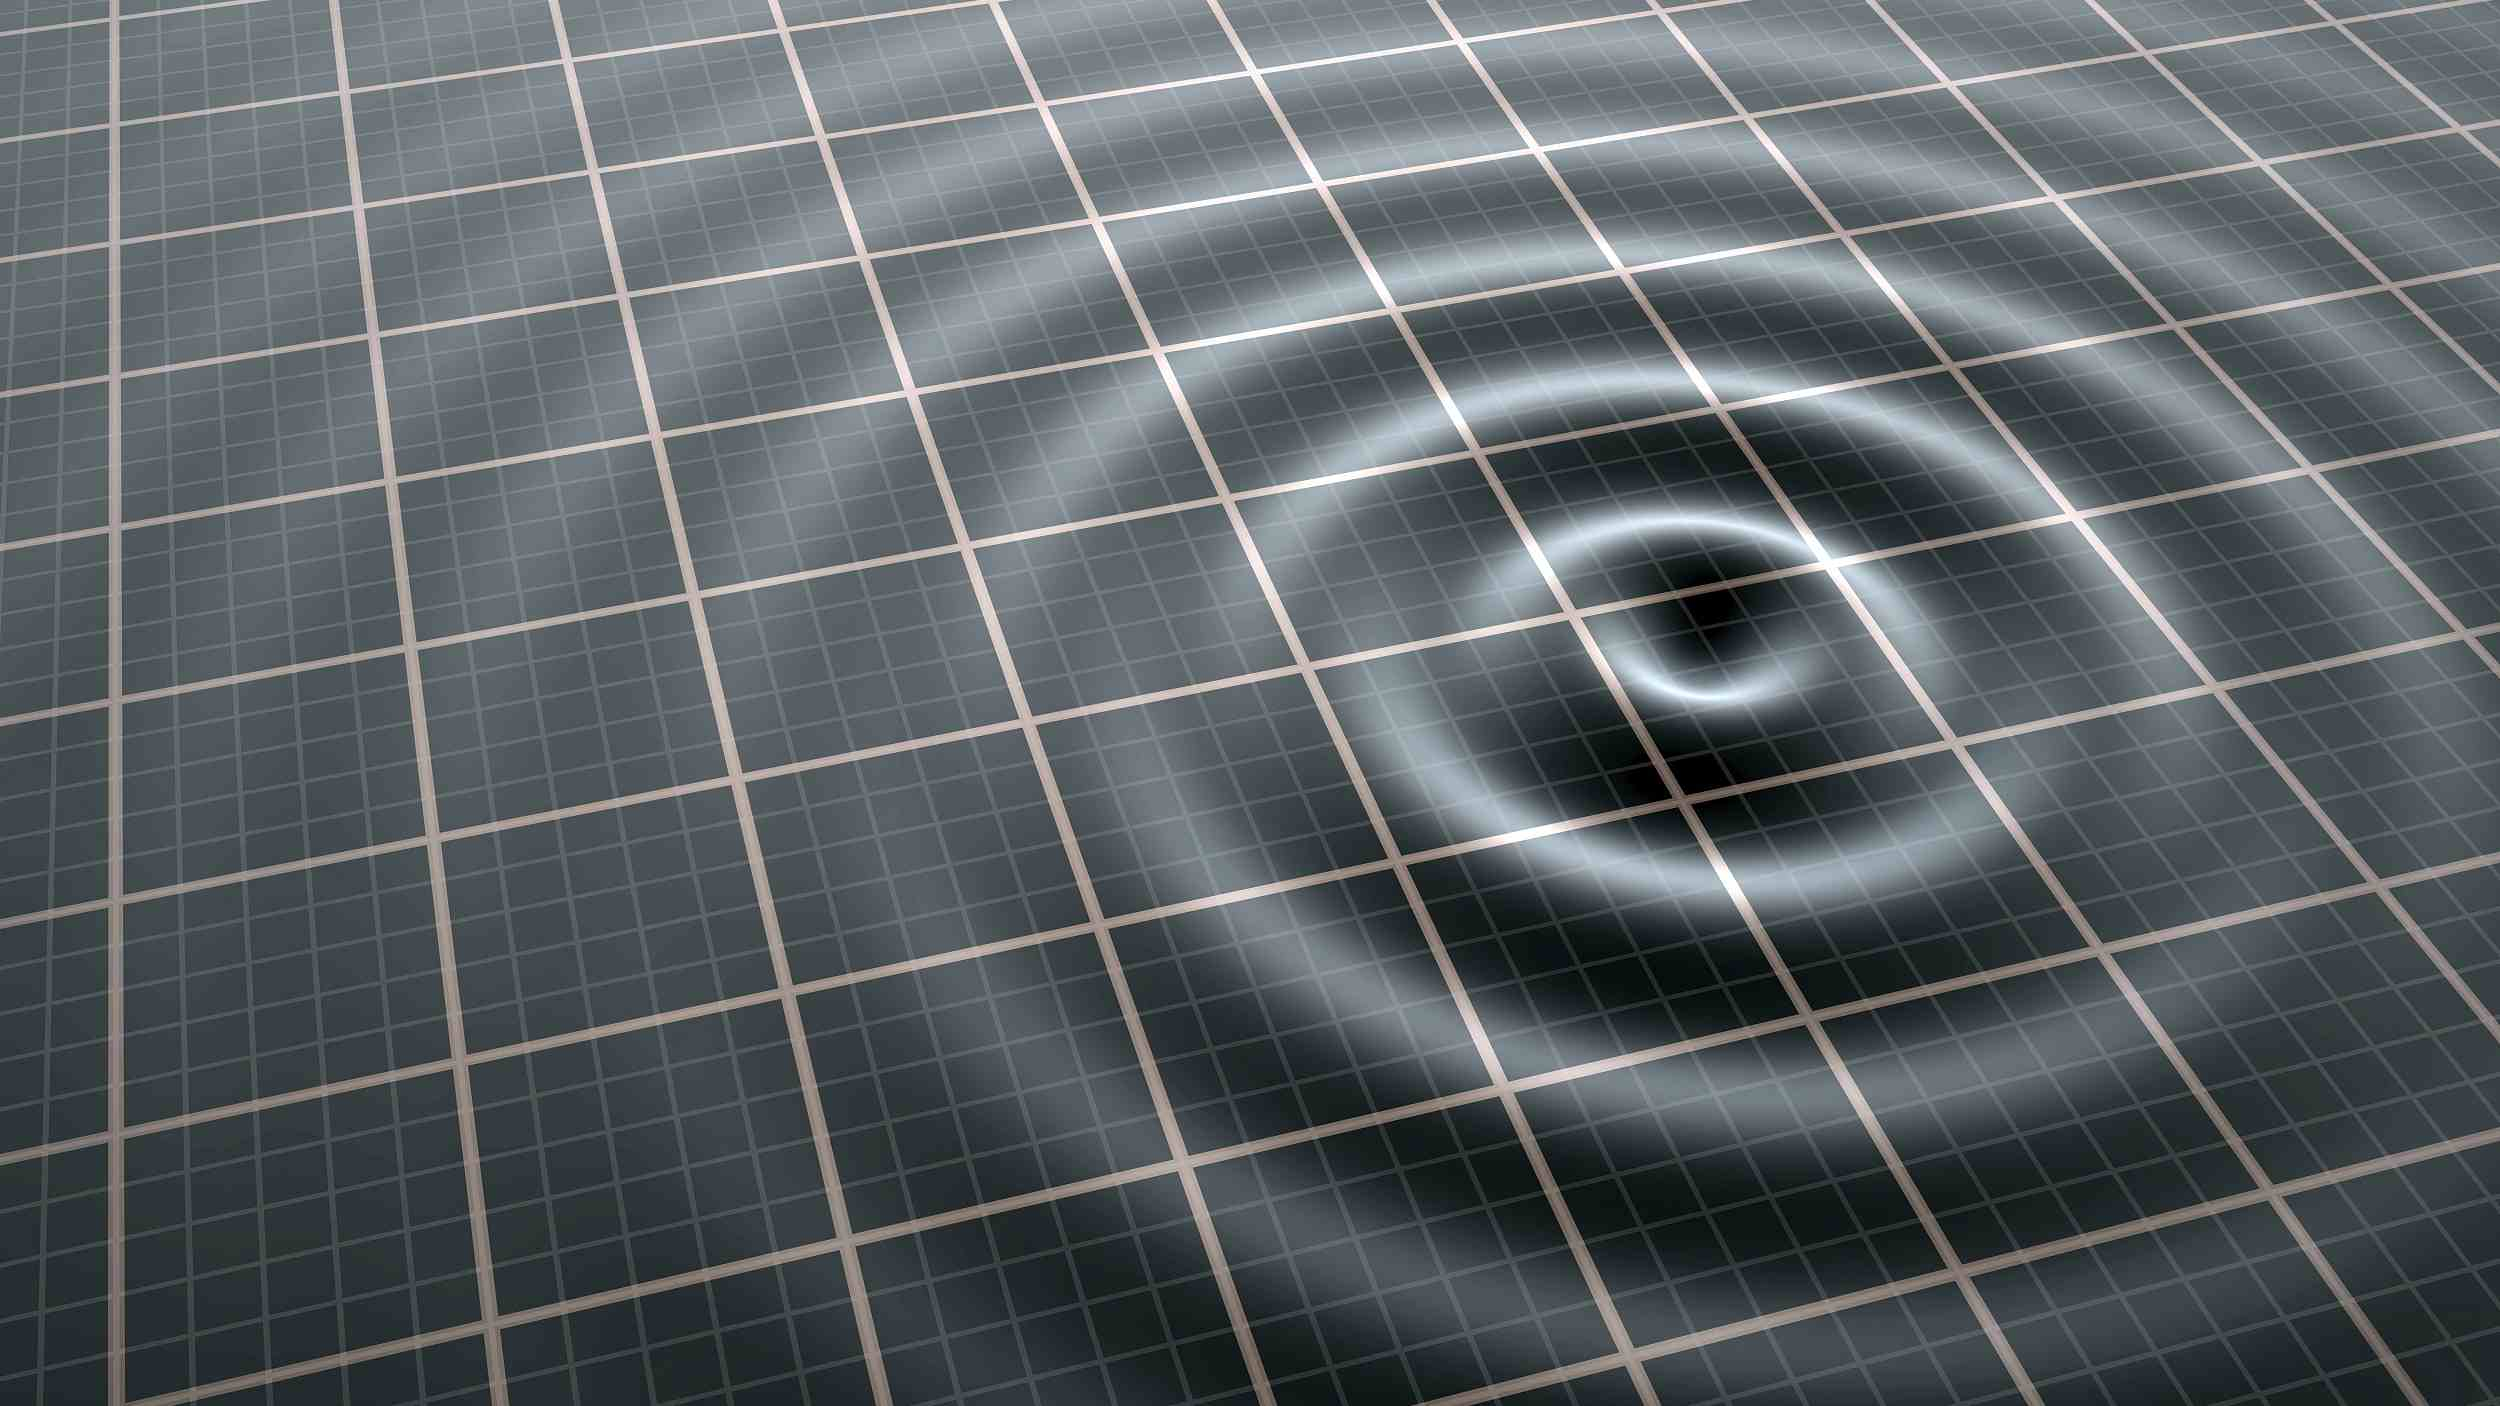 6.9-magnitude earthquake strikes off central Indonesia, no tsunami alert issued